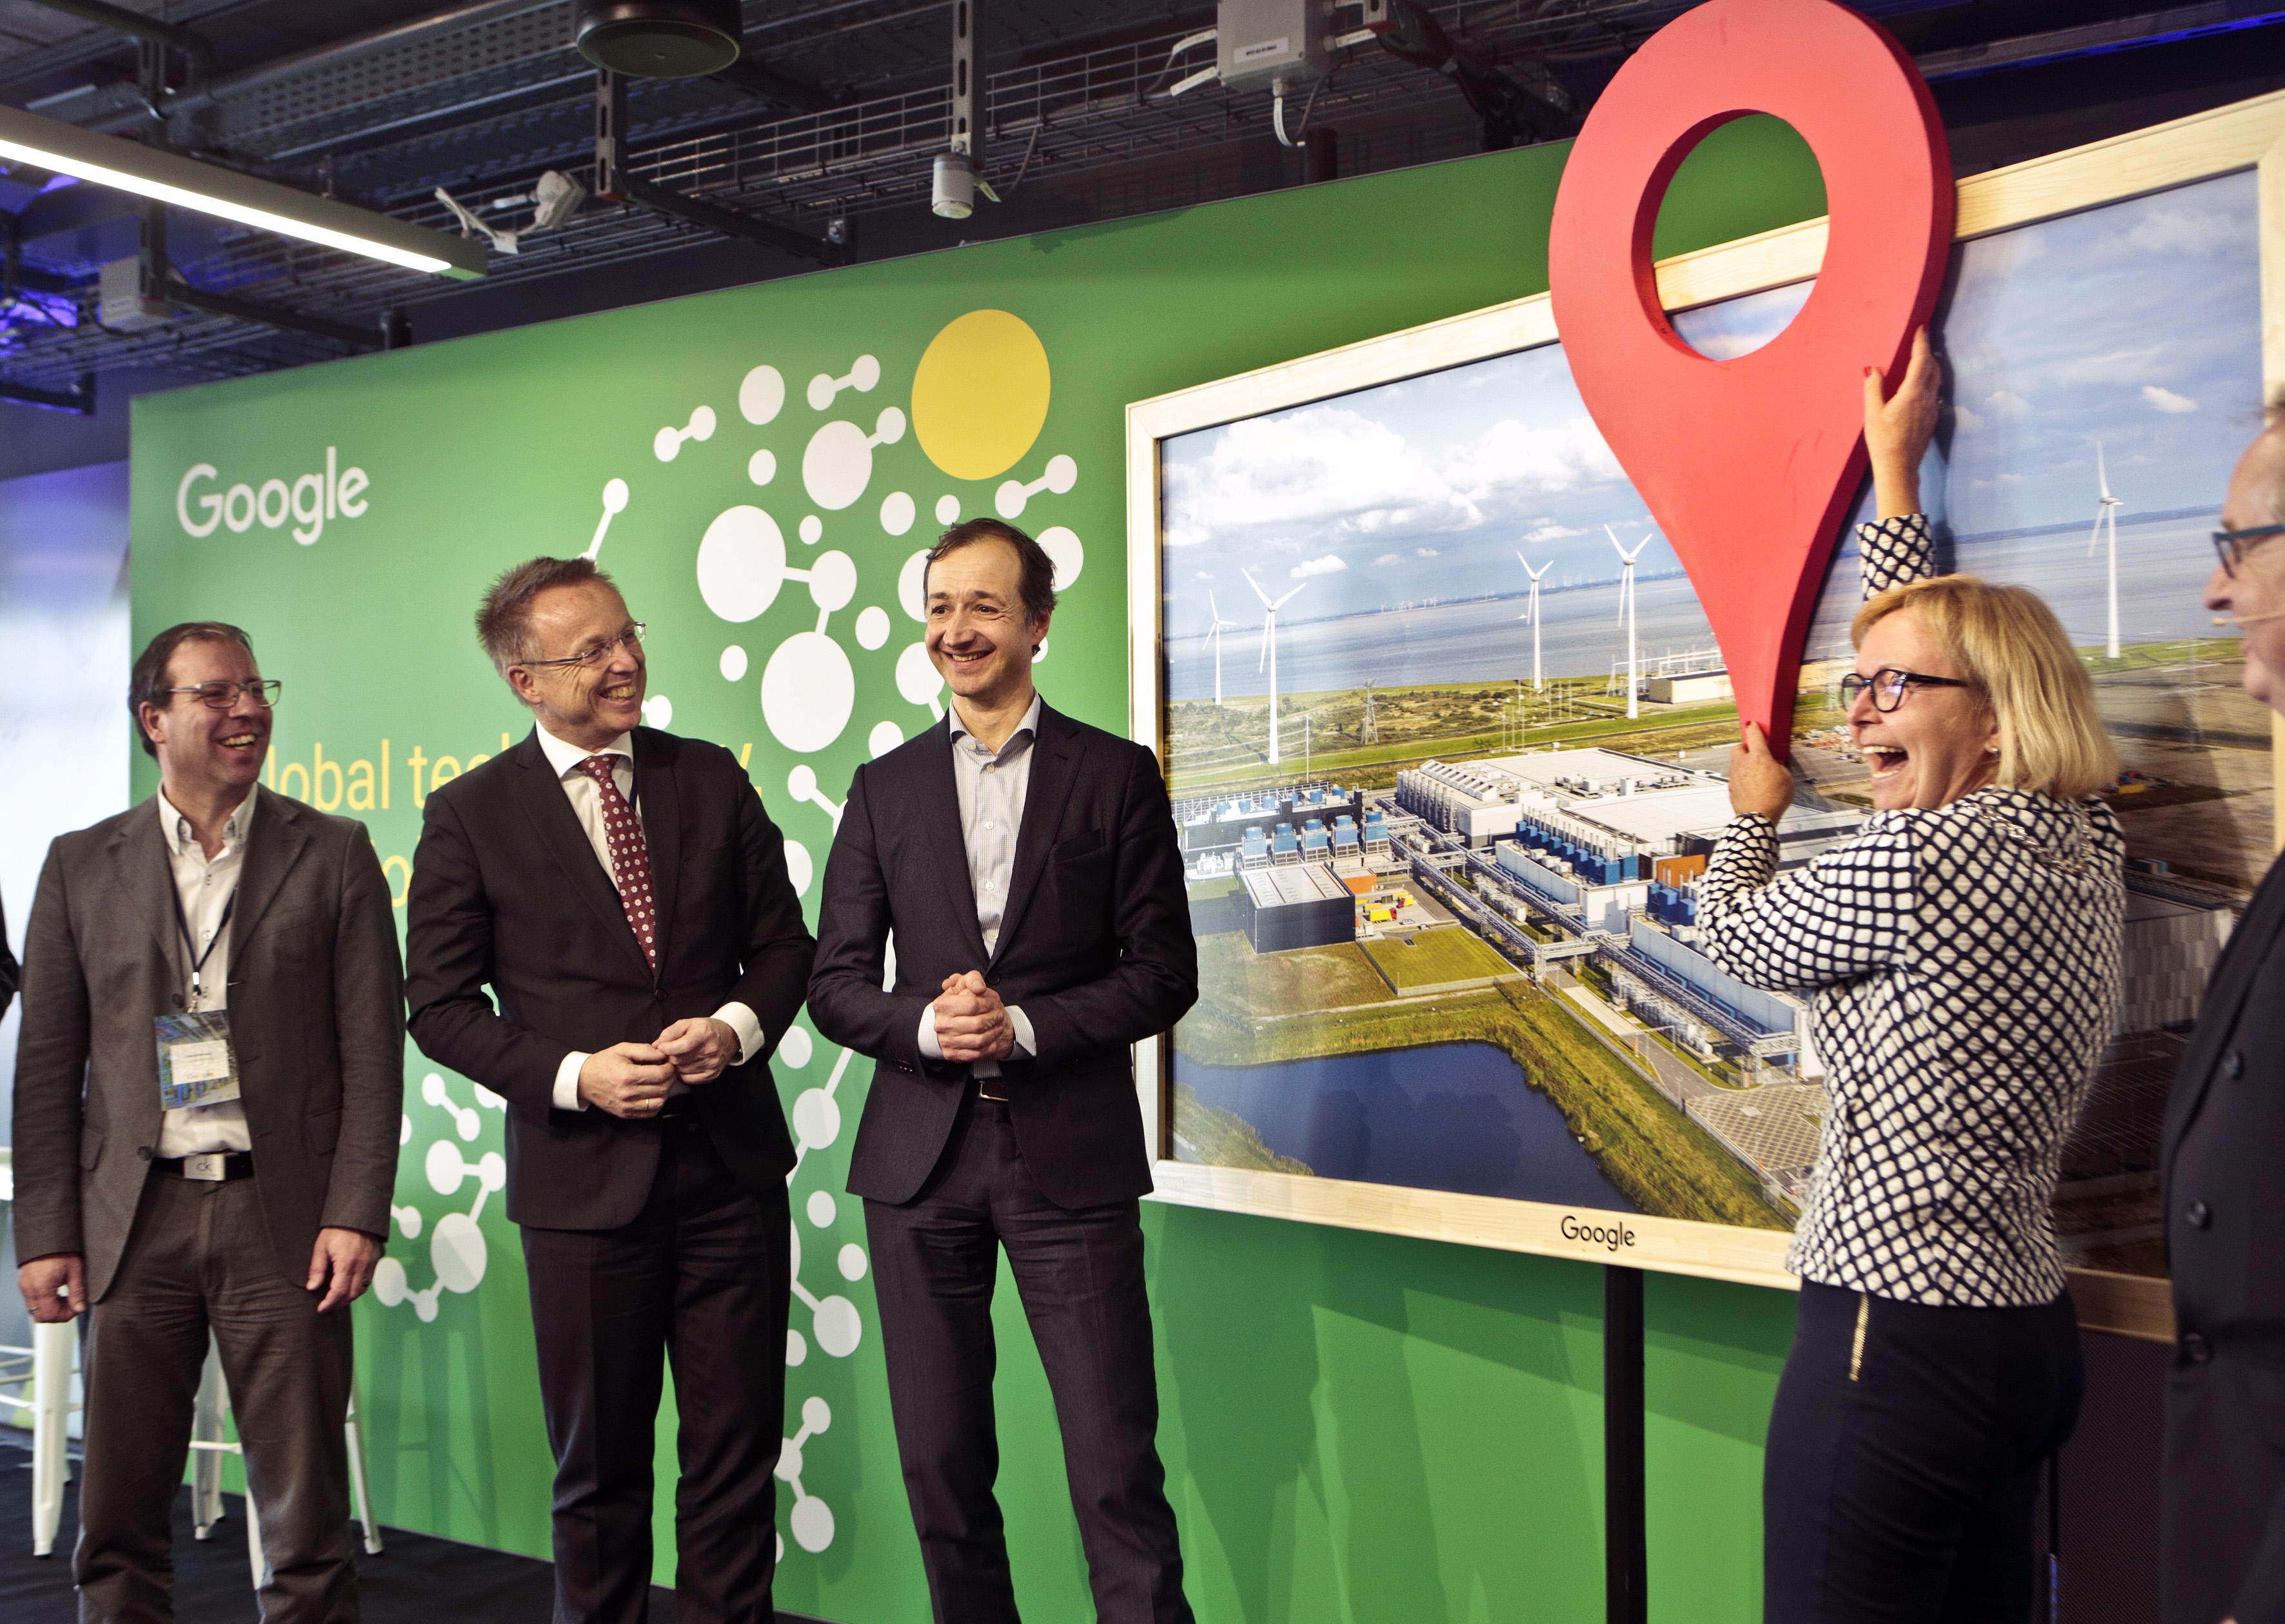 Google data center in Eemshaven